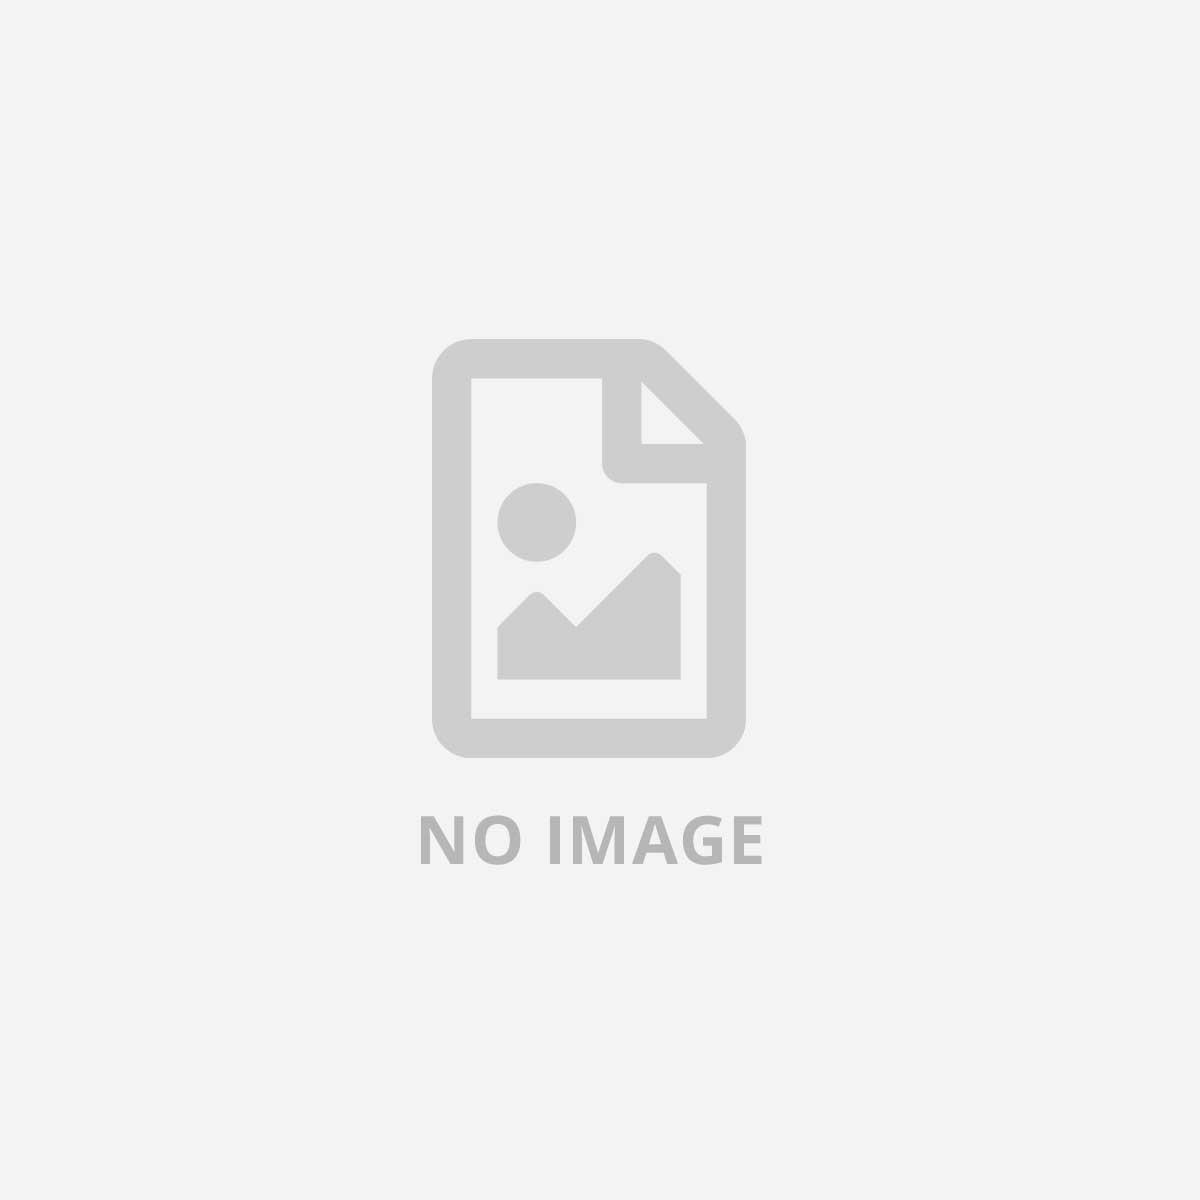 VERBATIM SPINDLE 10 DVD+R 4 7GB 16X CF.10  S